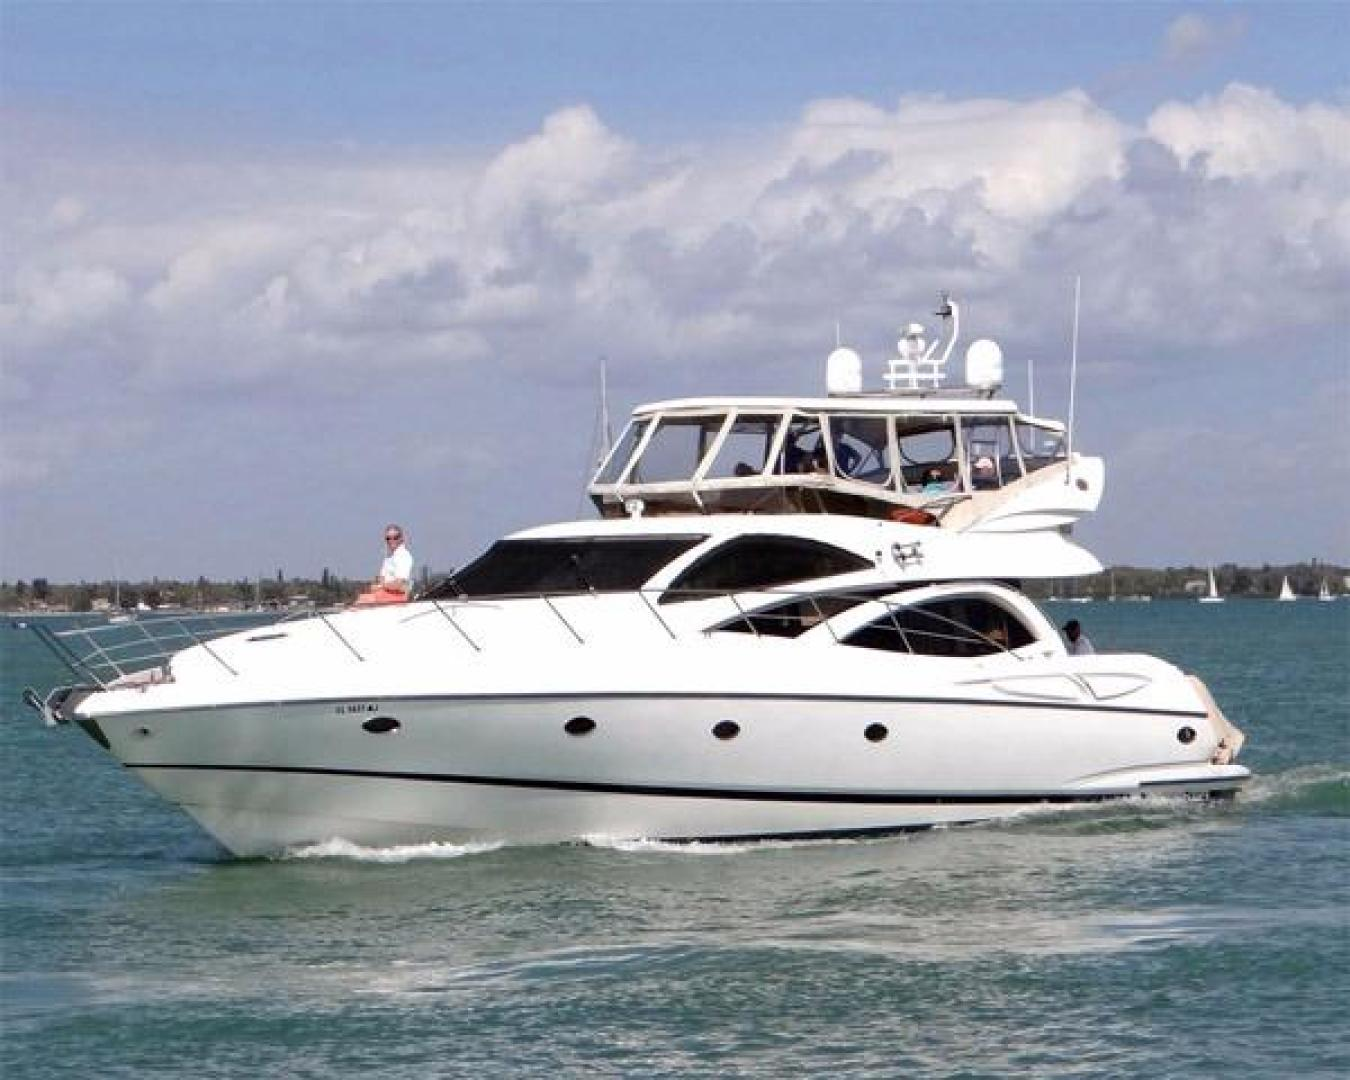 Sunseeker-Manhattan 64 2003-Dealership Fort Lauderdale-Florida-United States-Profile-375974 | Thumbnail